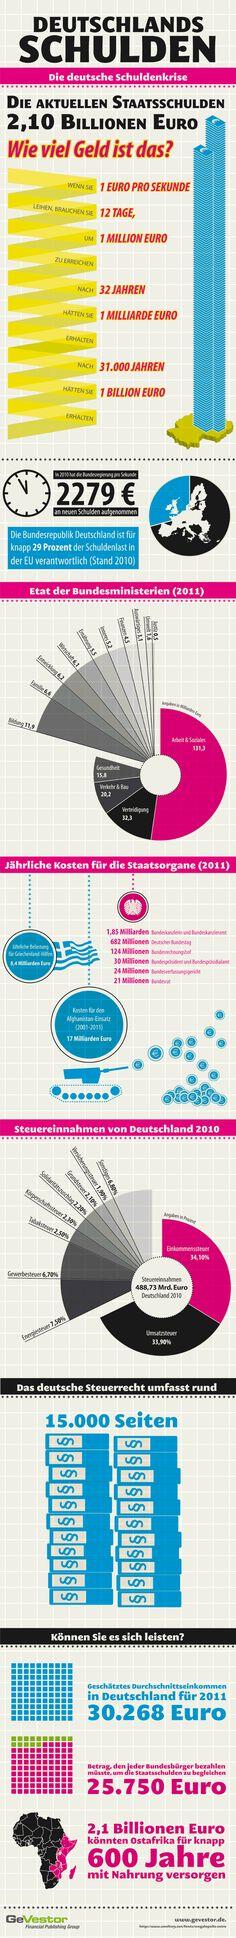 89 best Infografiken images on Pinterest   German language learning ...